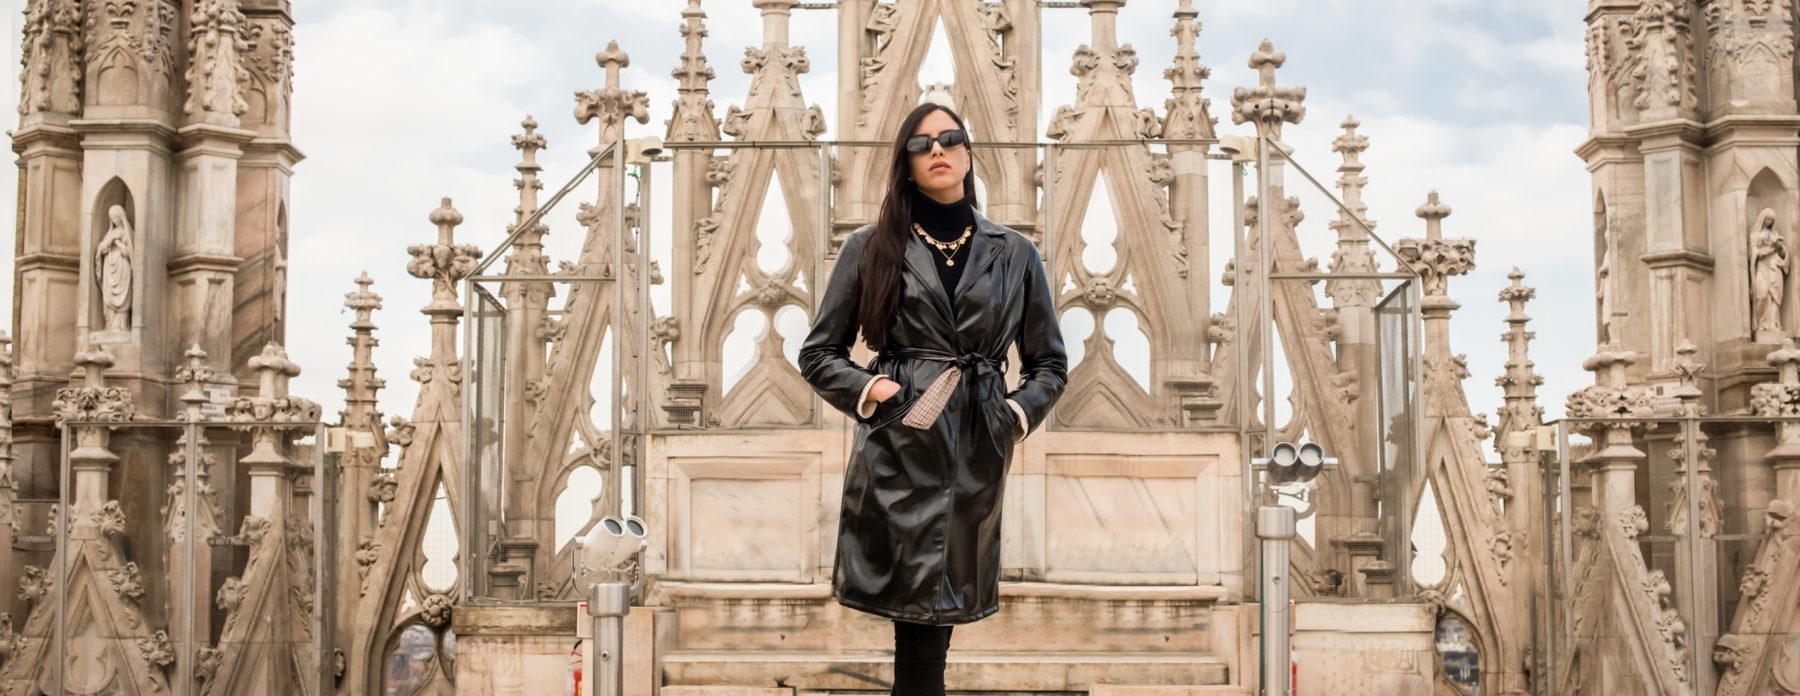 Milano da vedere Eleonora Bernardi Zizola